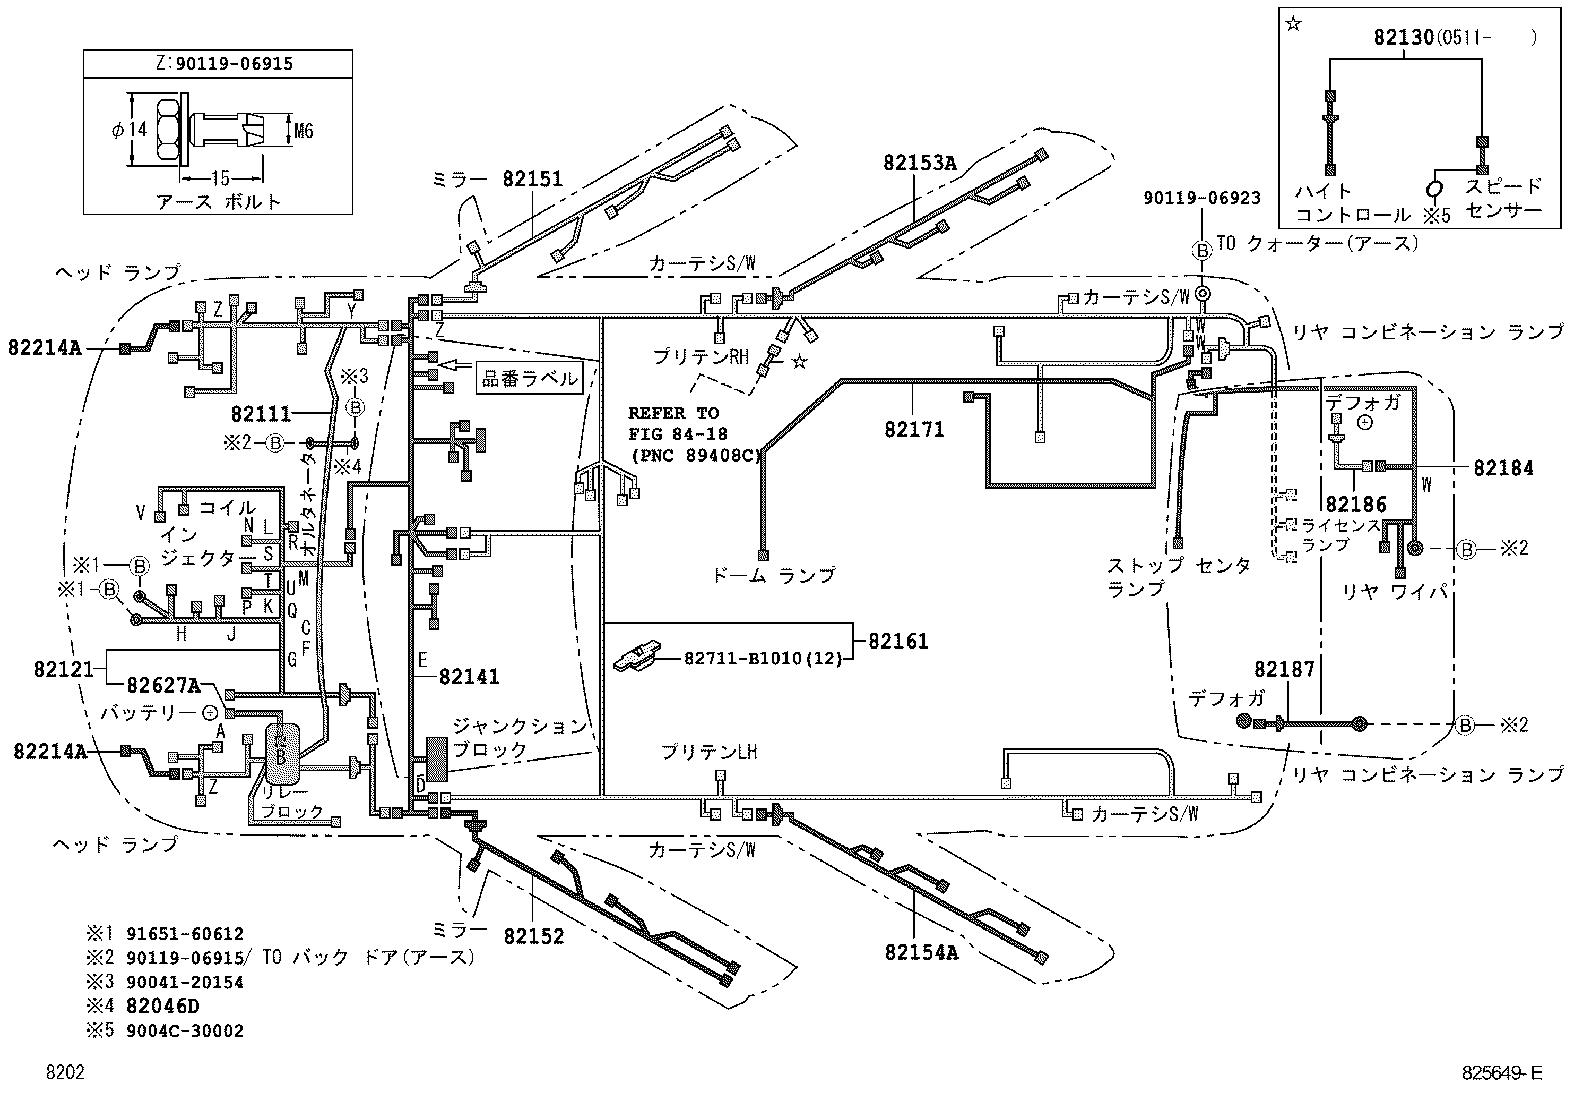 toyota passokgc10 ahsak electrical wiring clamp japan parts eu rh japan parts eu Toyota Electrical Wiring Diagram Toyota Tacoma Electrical Wiring Diagram